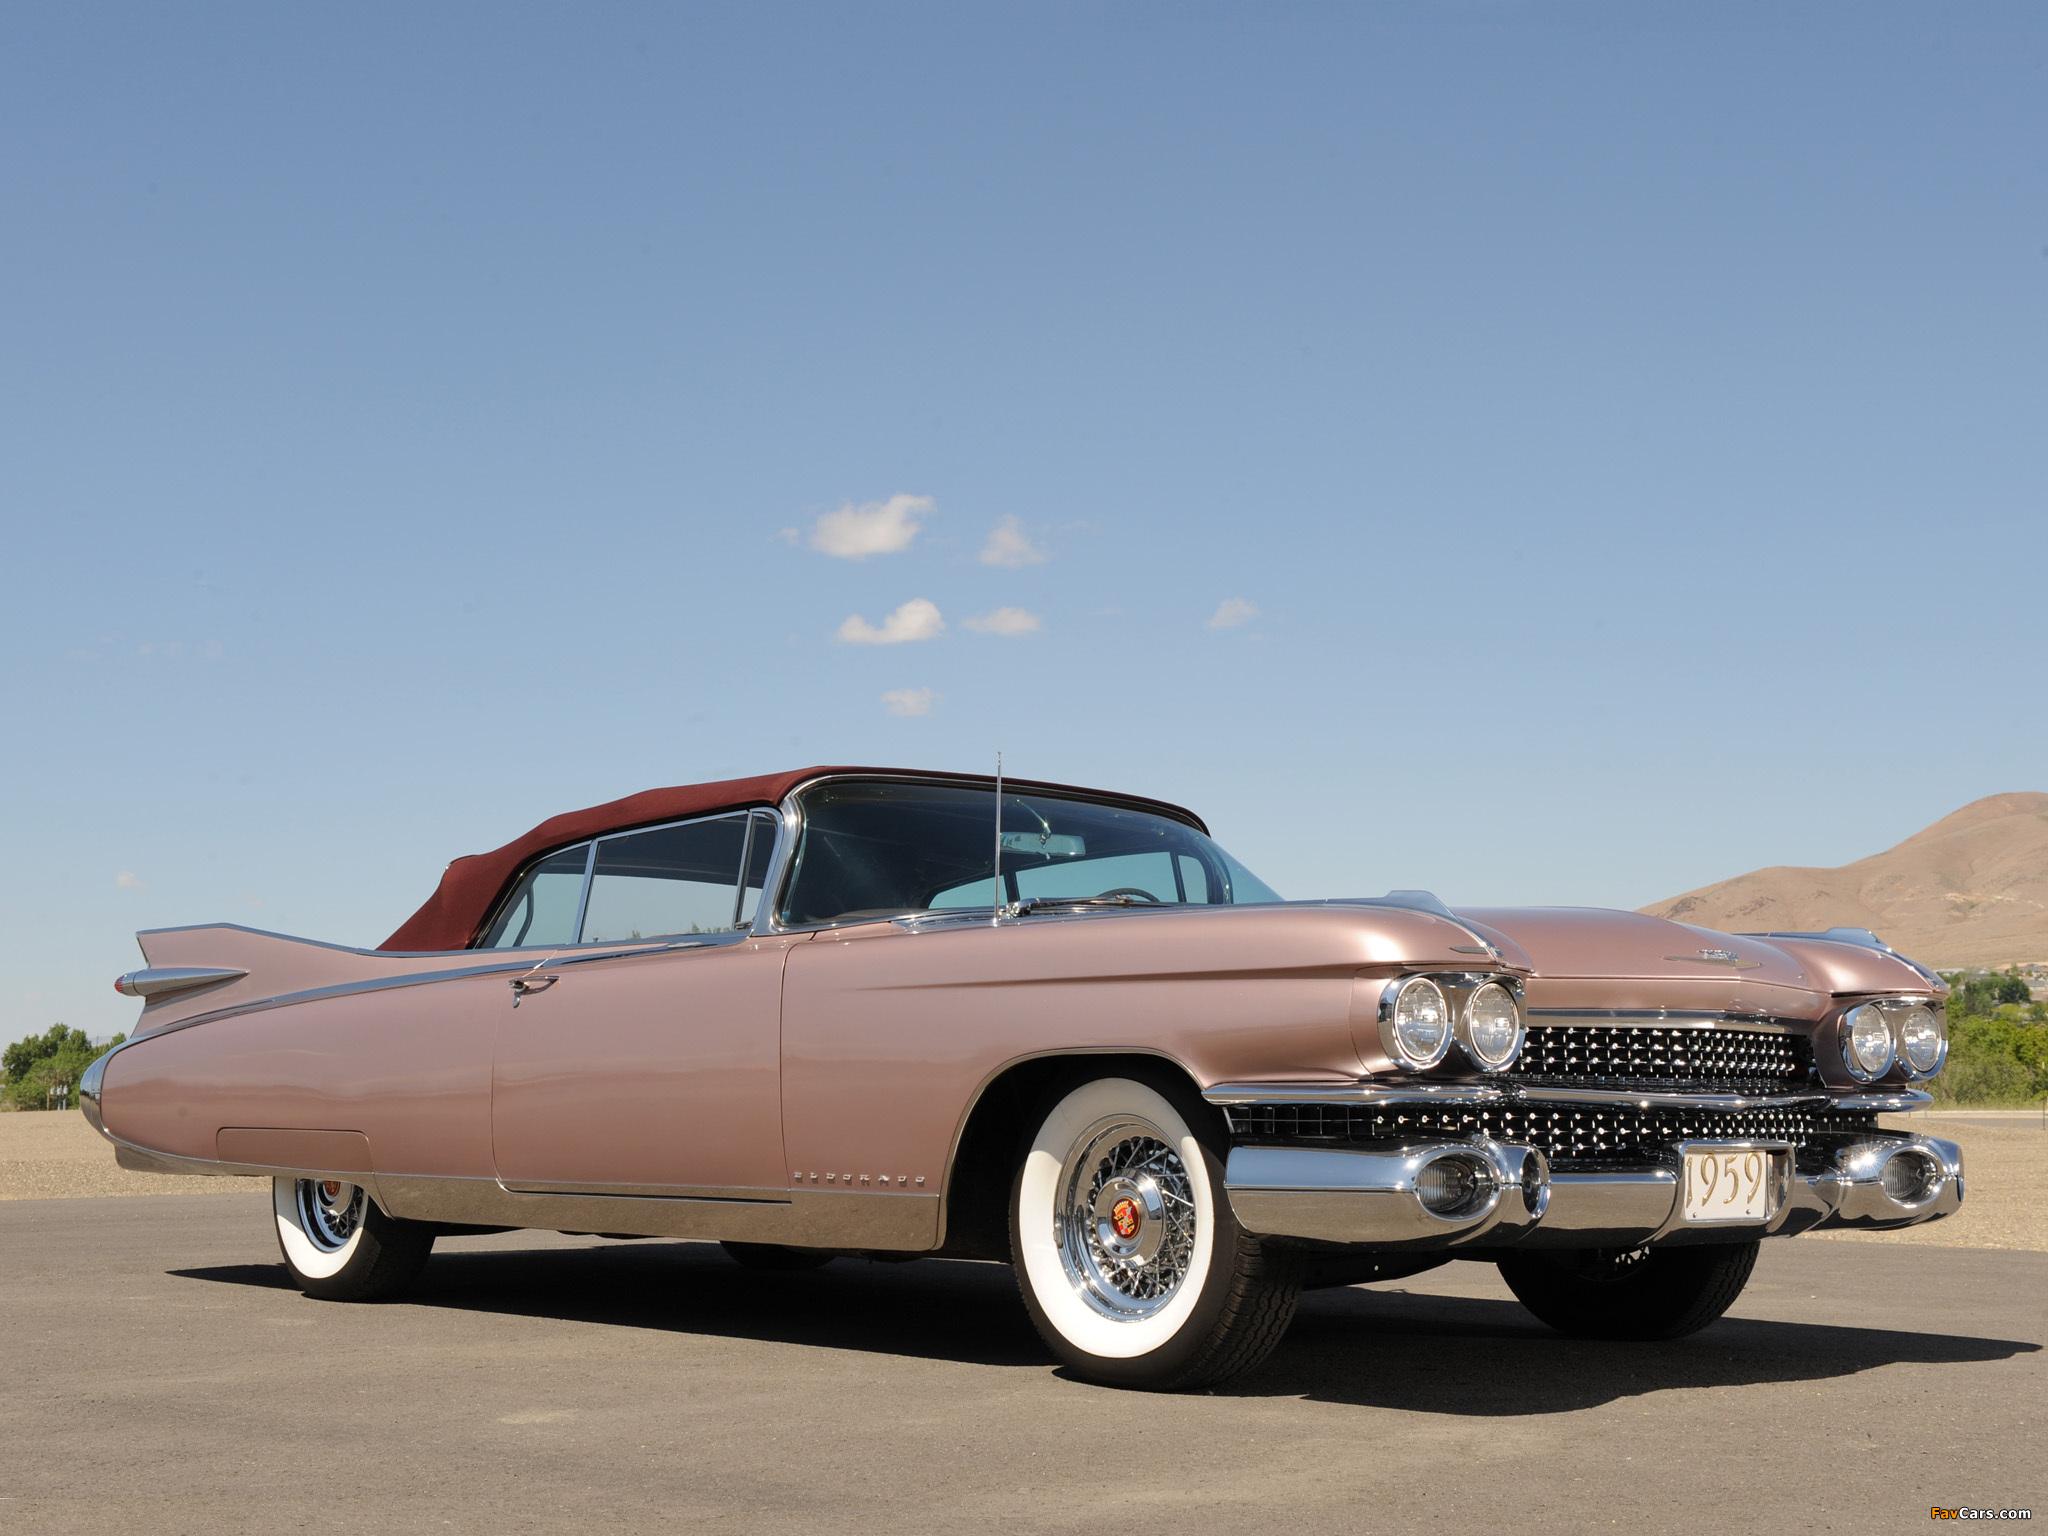 carros antigos - cadilac eldorado 1959